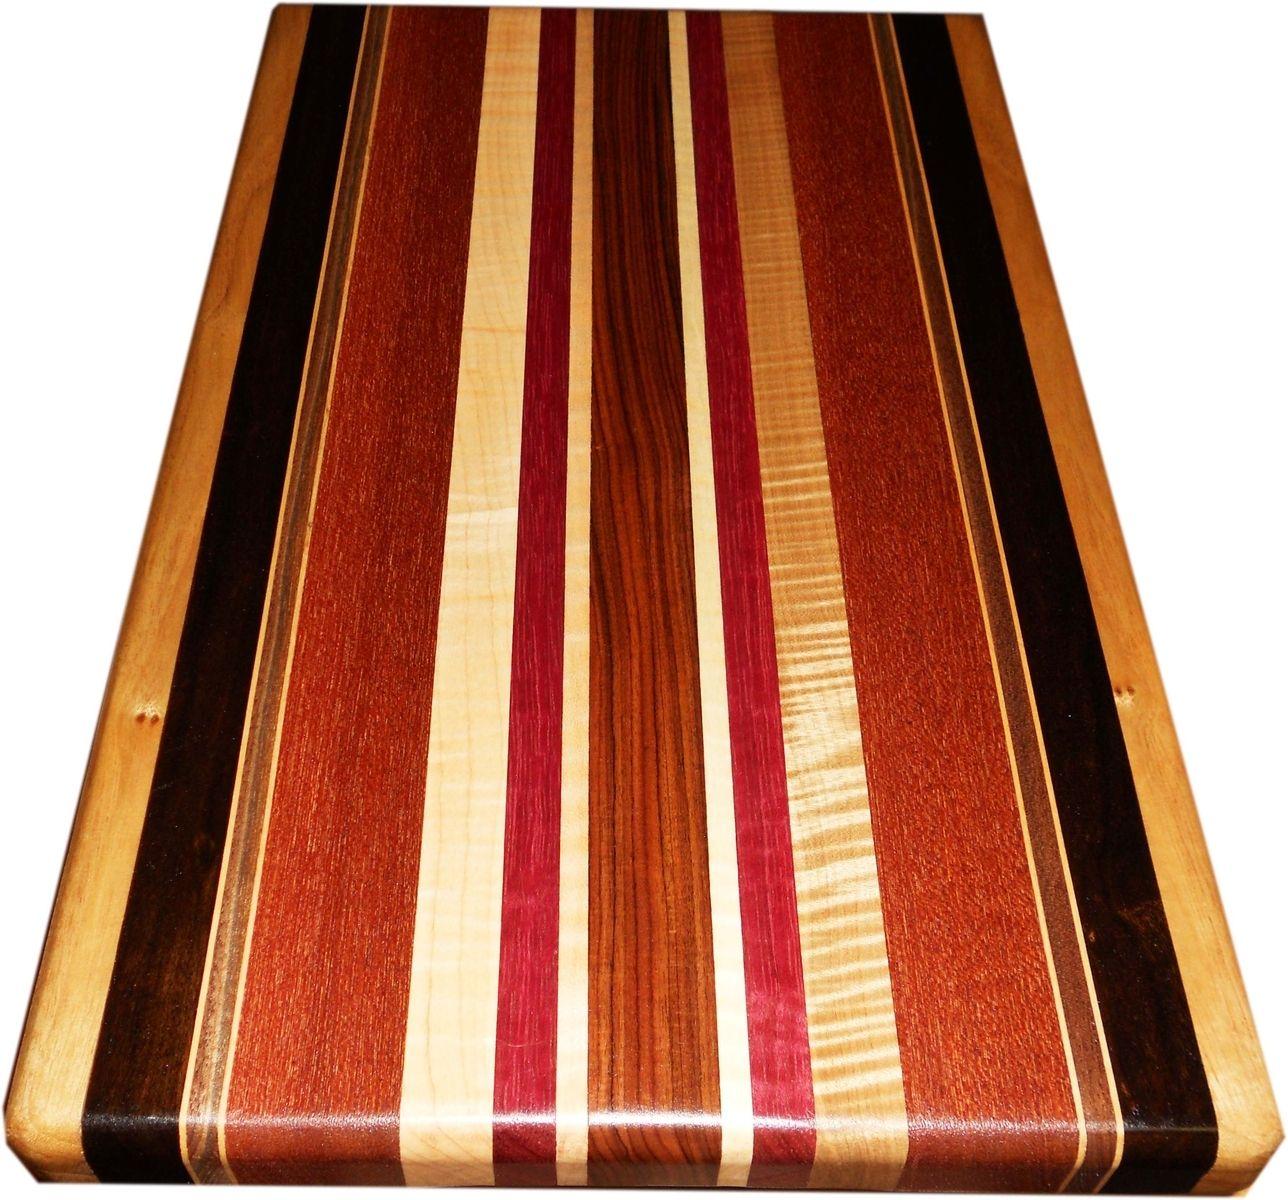 Buy A Custom Made Exotic Wood Cutting Board Full Size